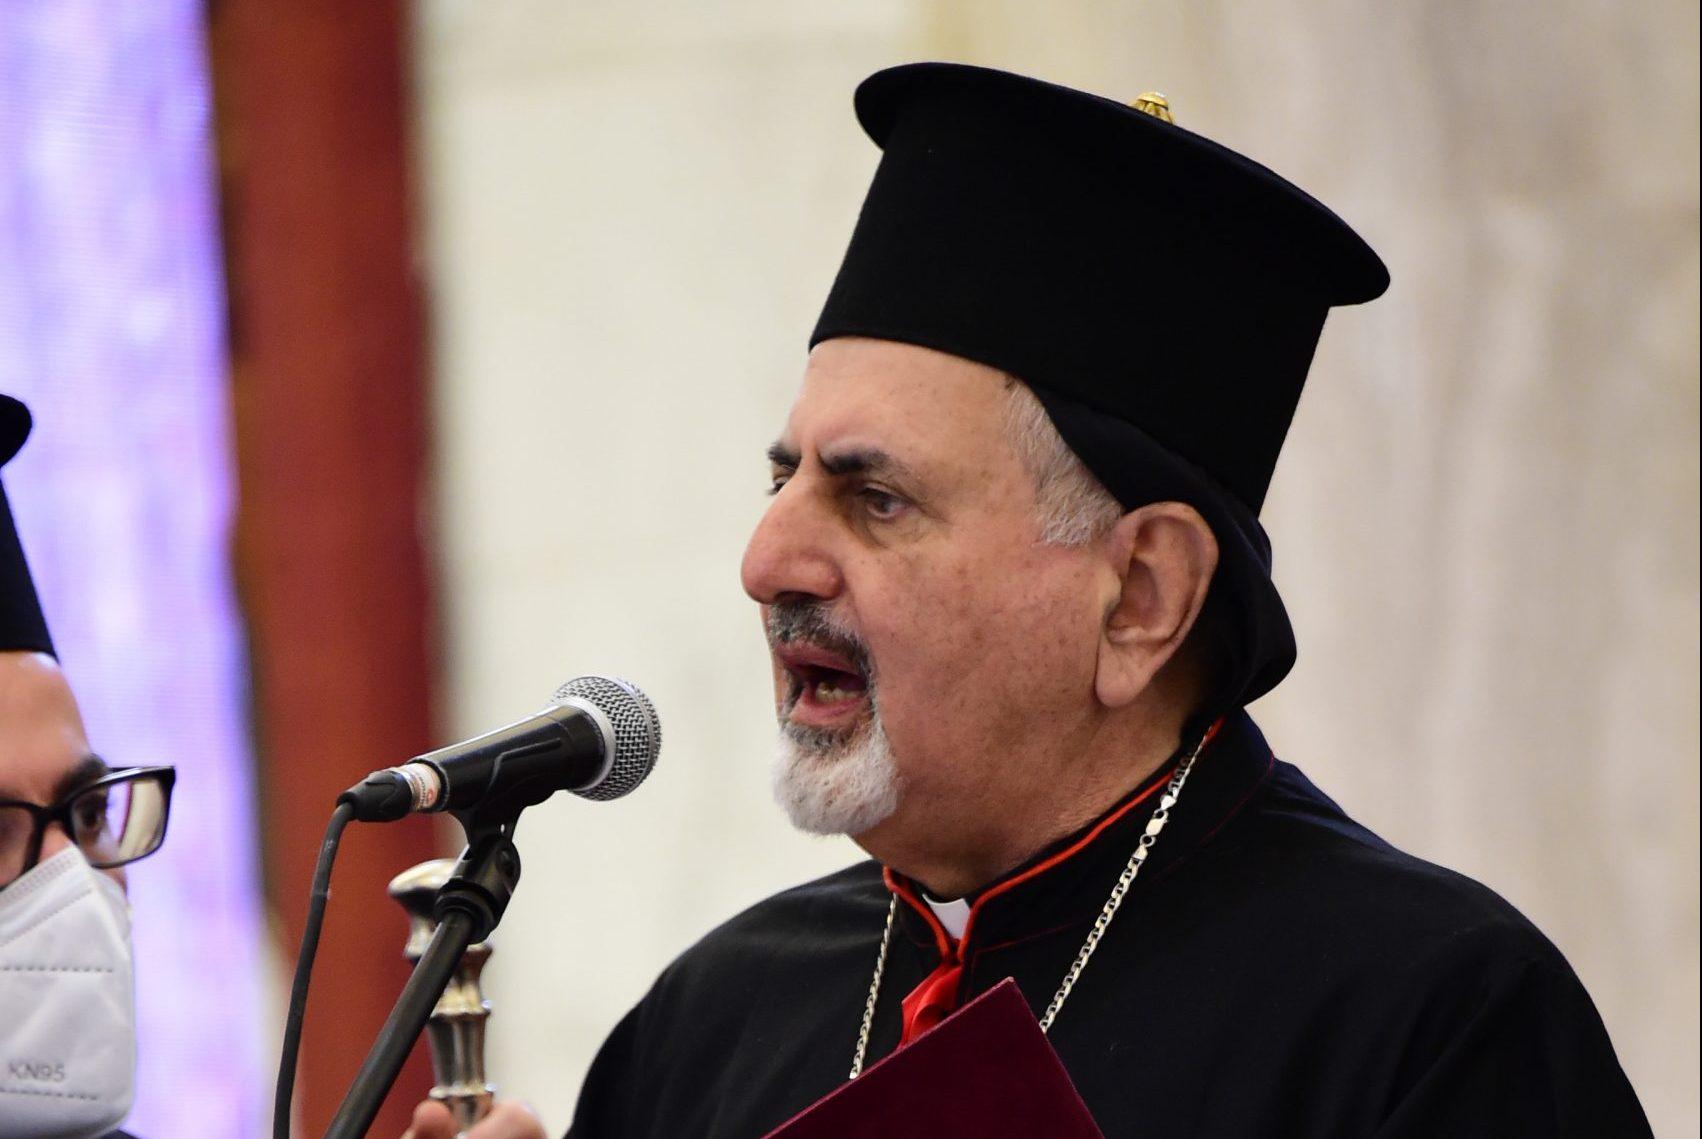 With image of Syriac Catholic Patriarch Ignatius Joseph III Younan (© Aid to the Church in Need)